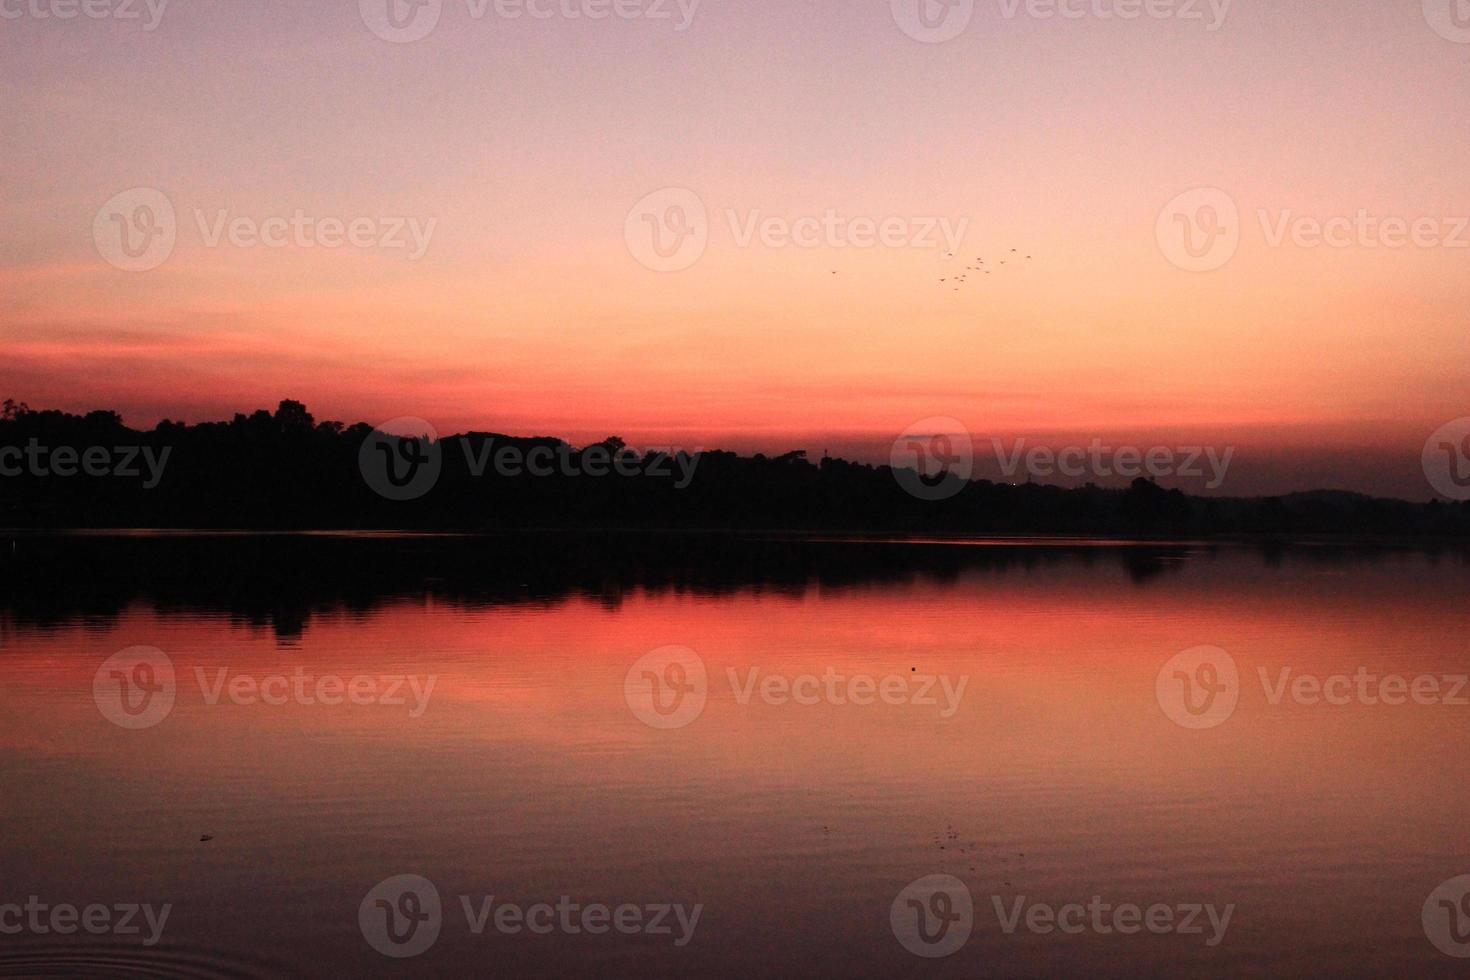 geweldige zonsondergang foto